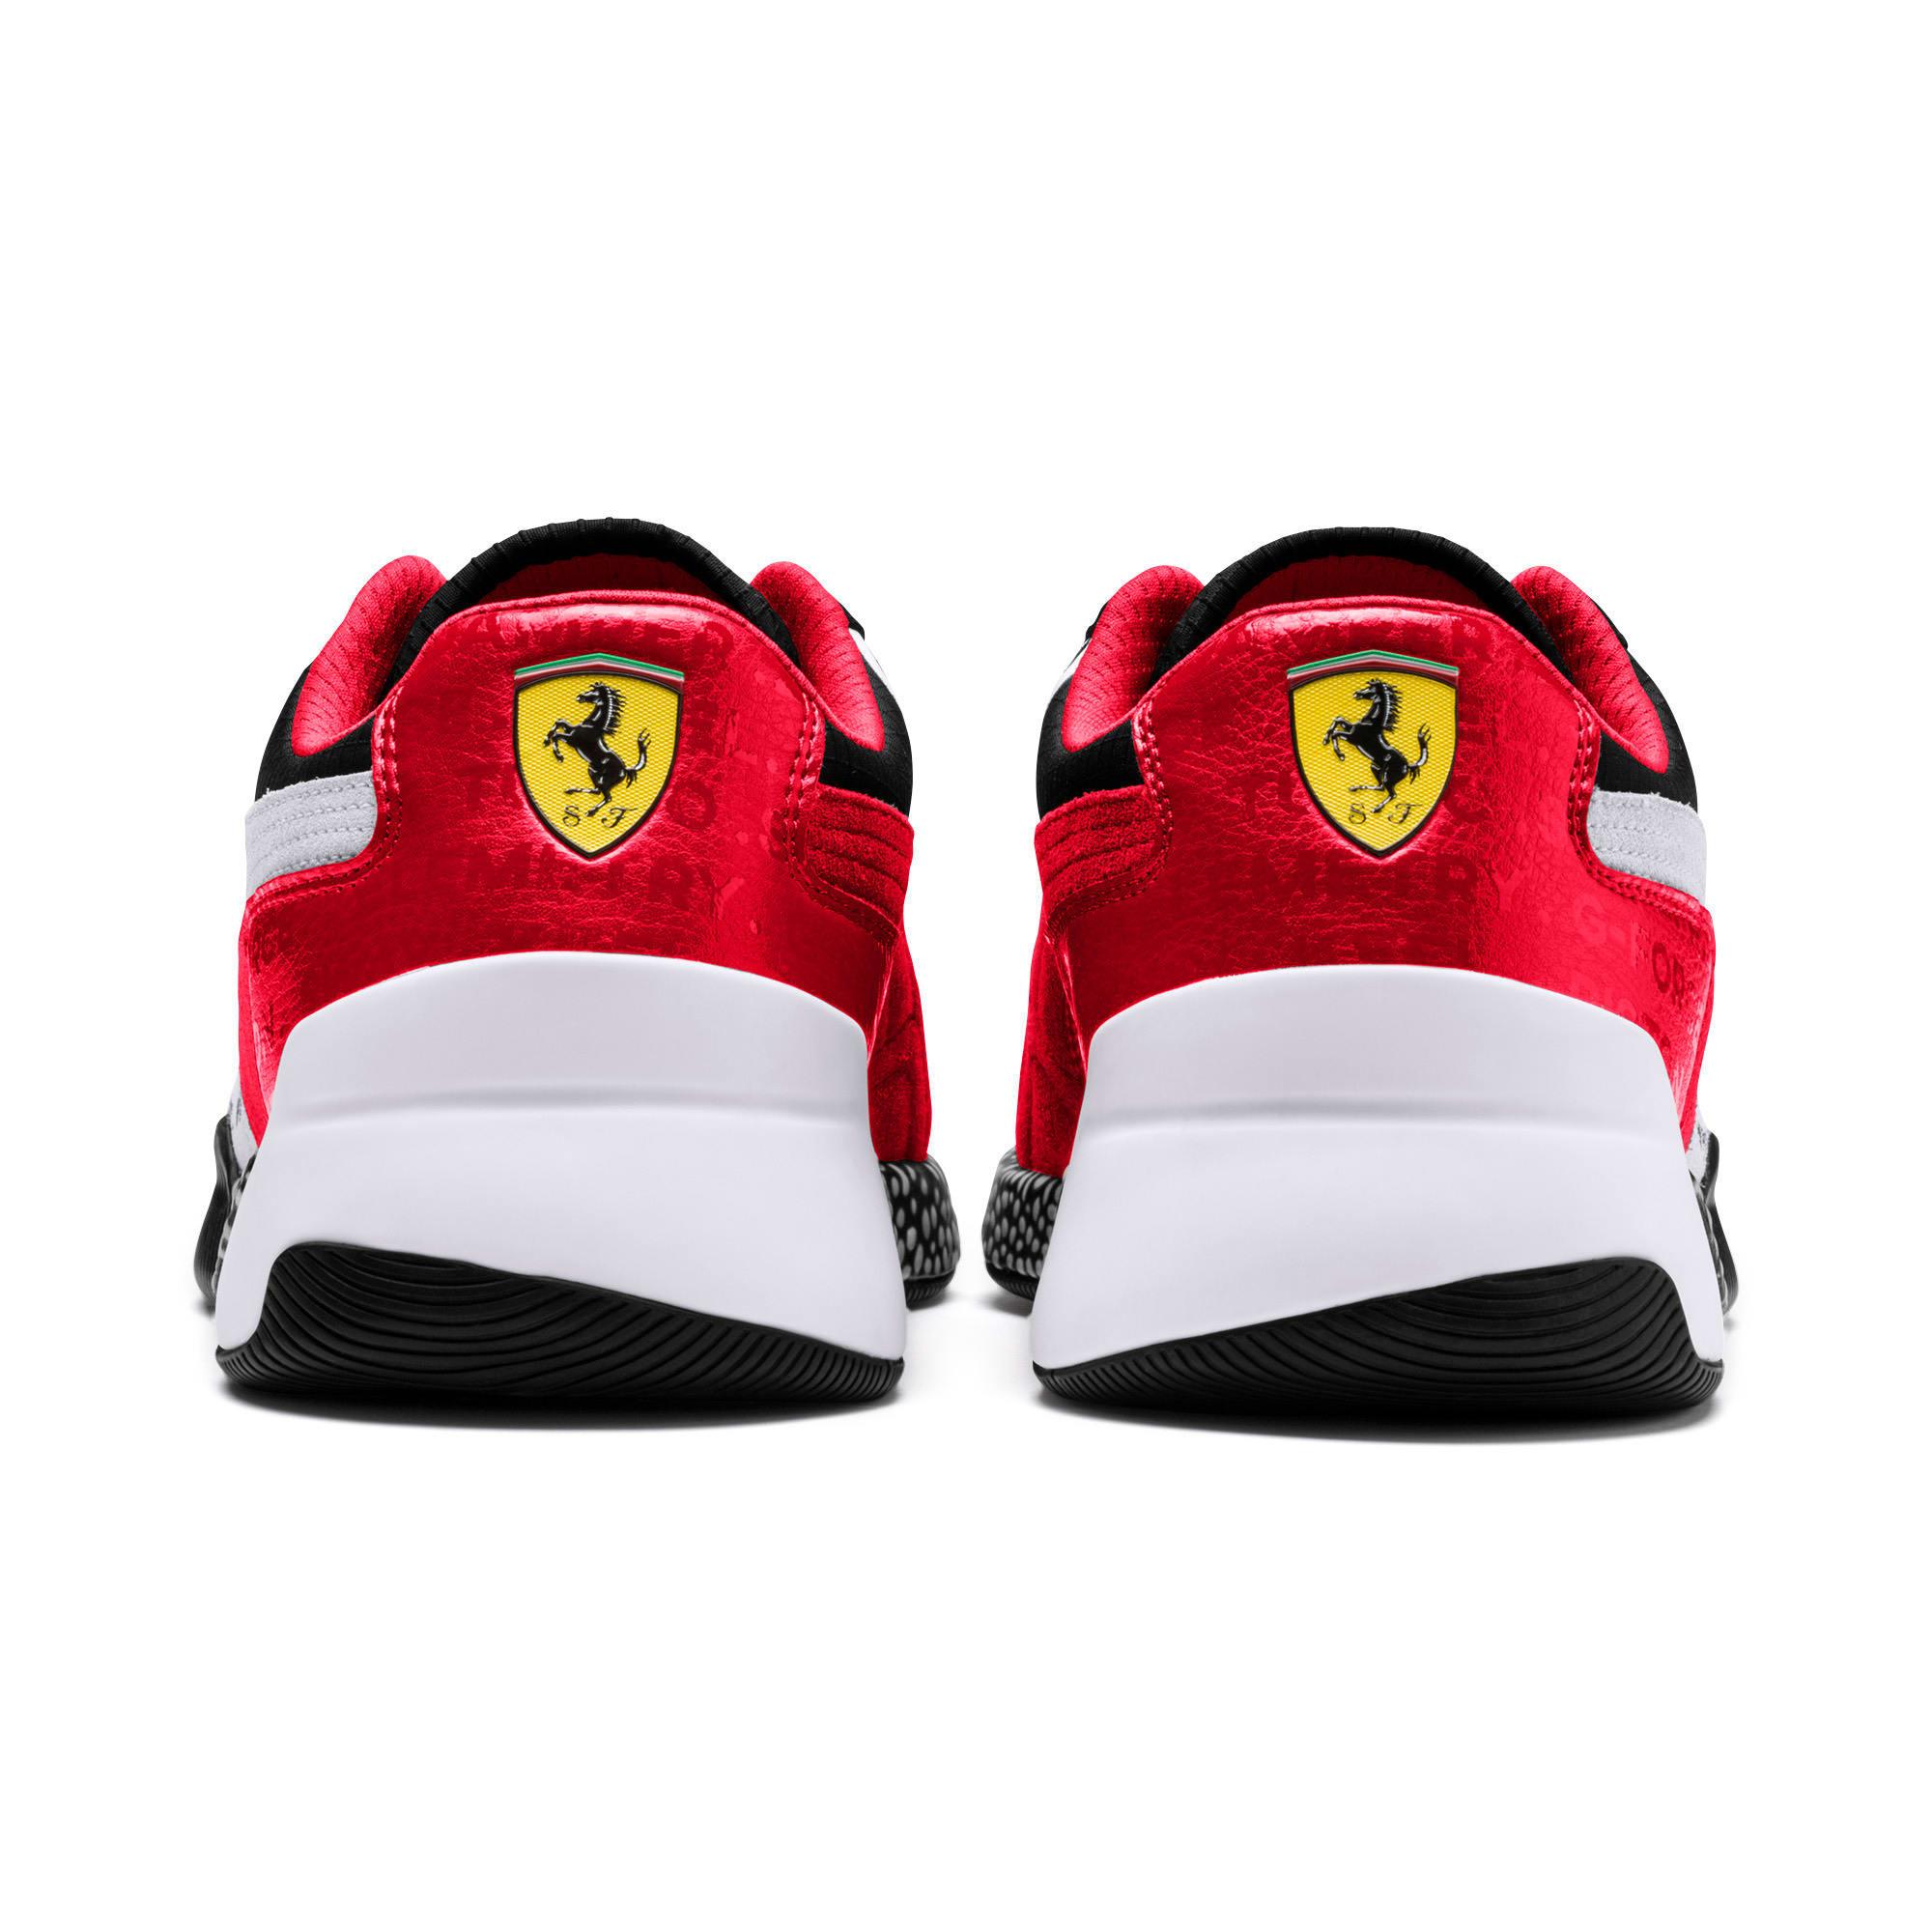 Thumbnail 4 of Ferrari Speed HYBRID Men's Trainers, Rosso Corsa-White-Black, medium